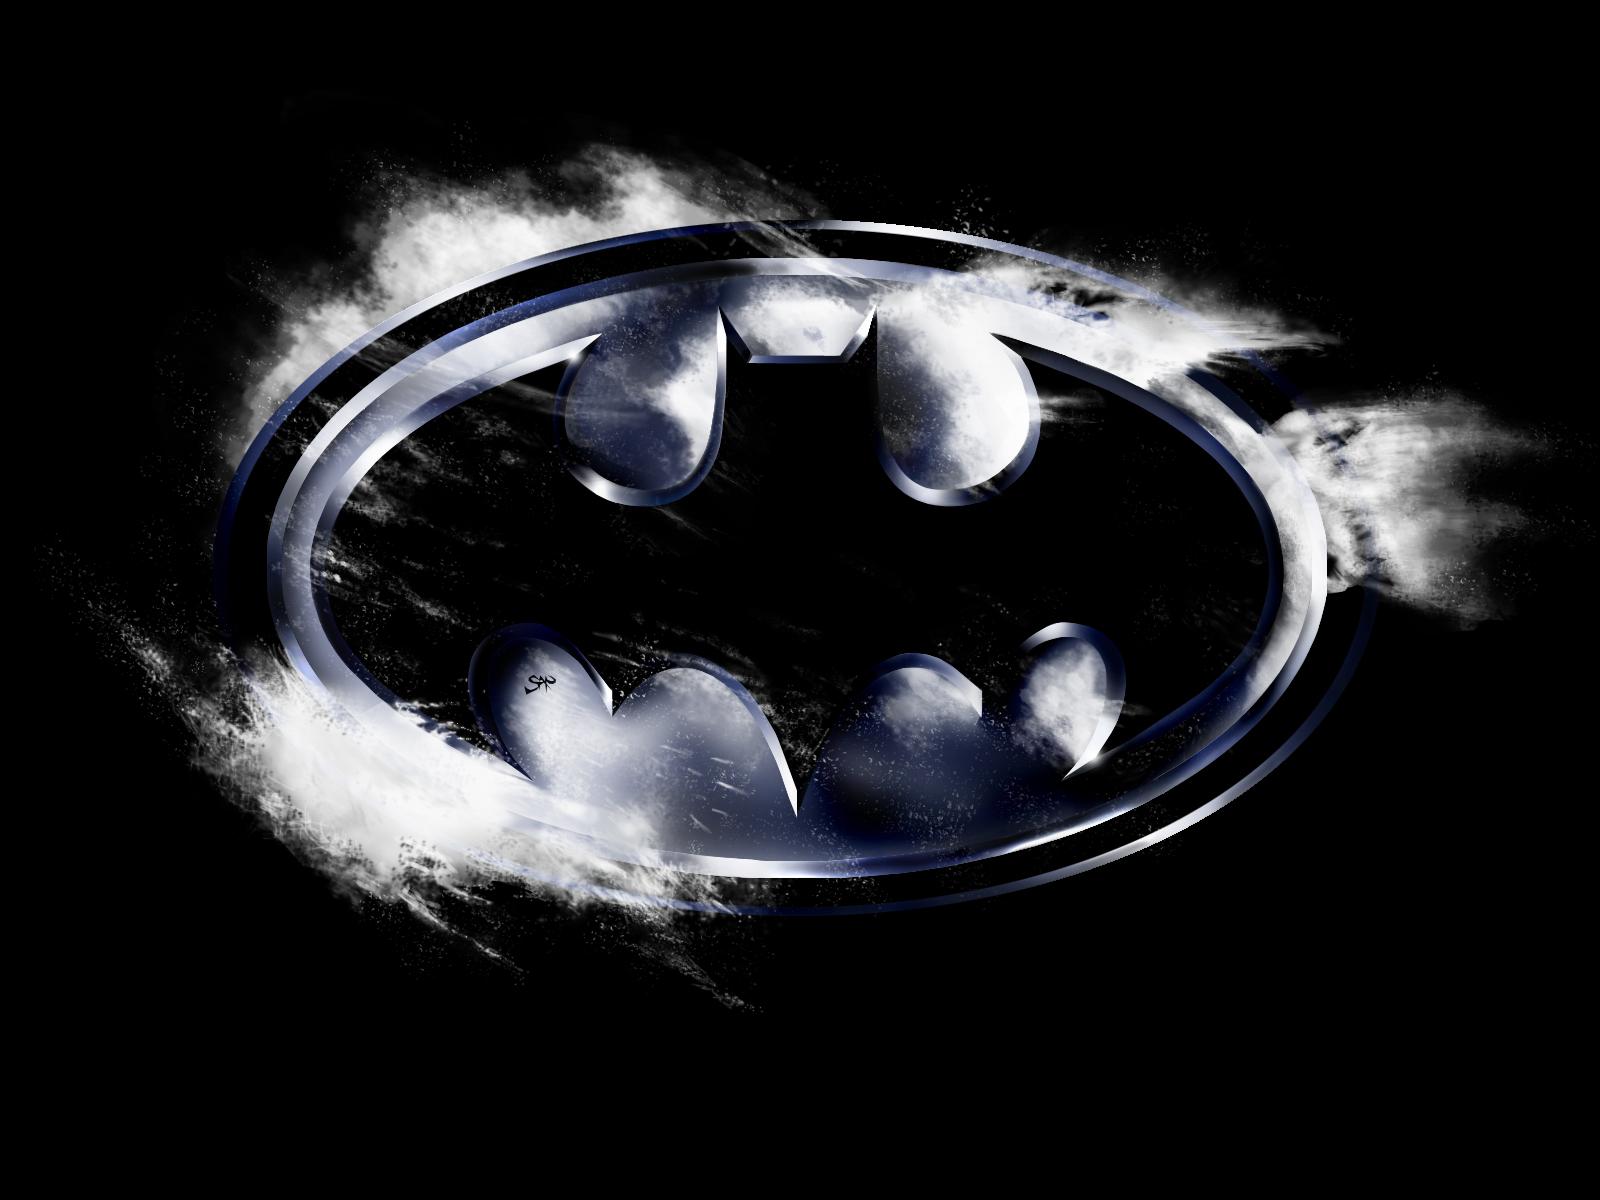 joker batman logo tattoo art batman begins logo batman superman logo 1600x1200